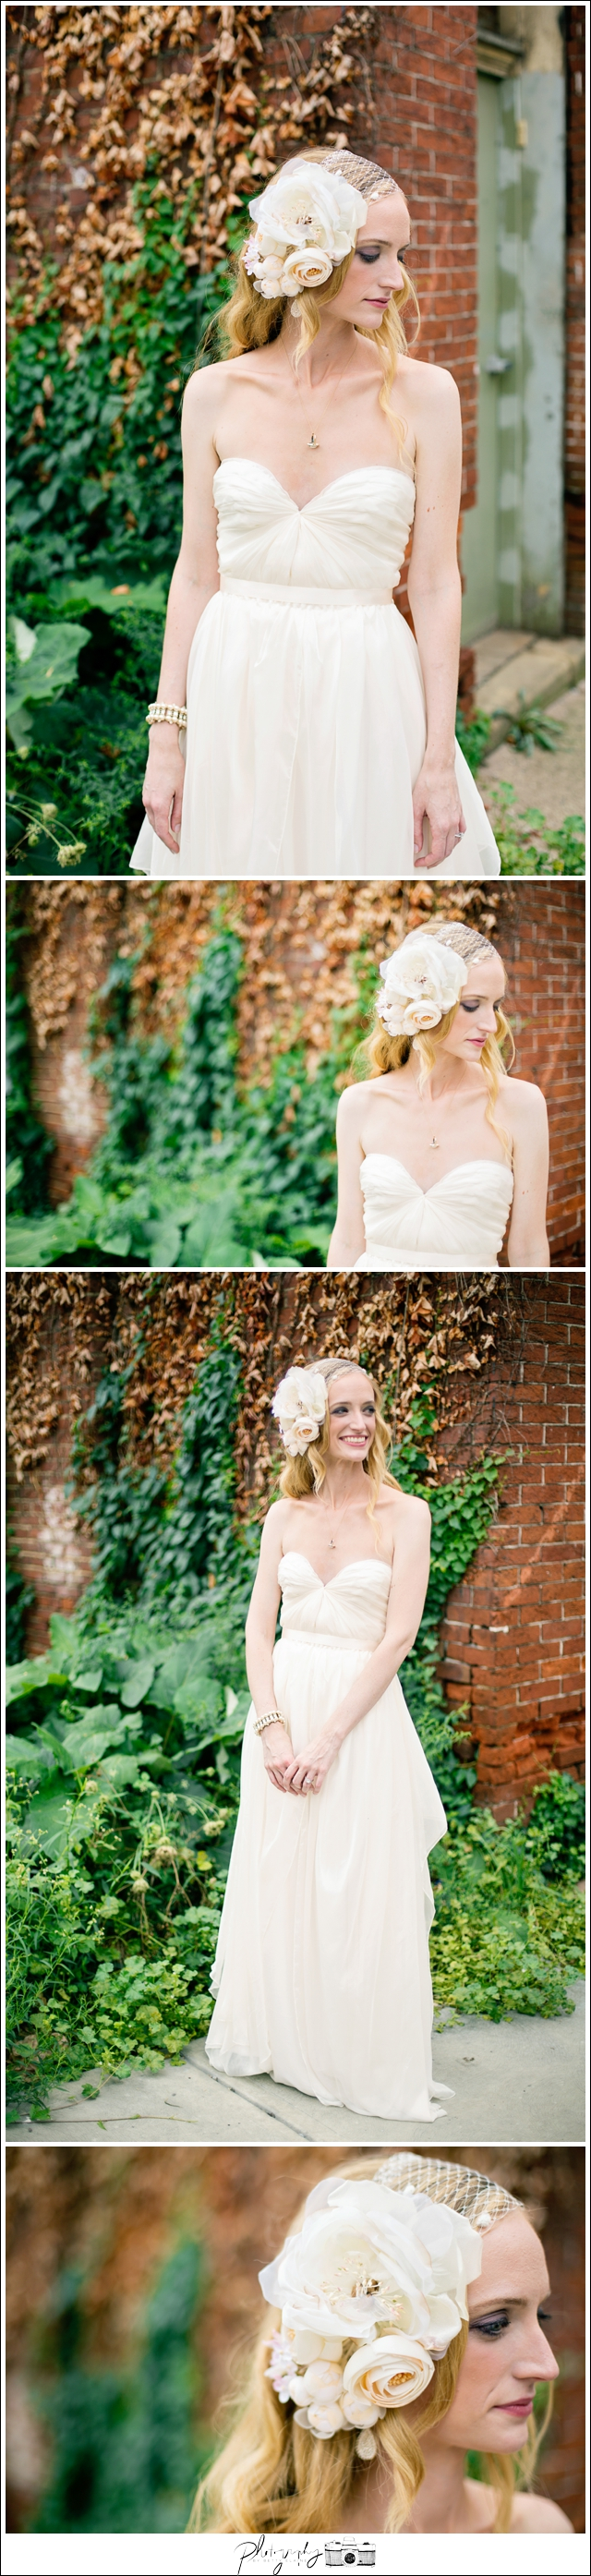 26-Bridal-Portraits-Twigs-&-Honey-Bride-North-Shore-Pittsburgh-Destination-Seattle-Wedding-Photography-by-Betty-Elaine